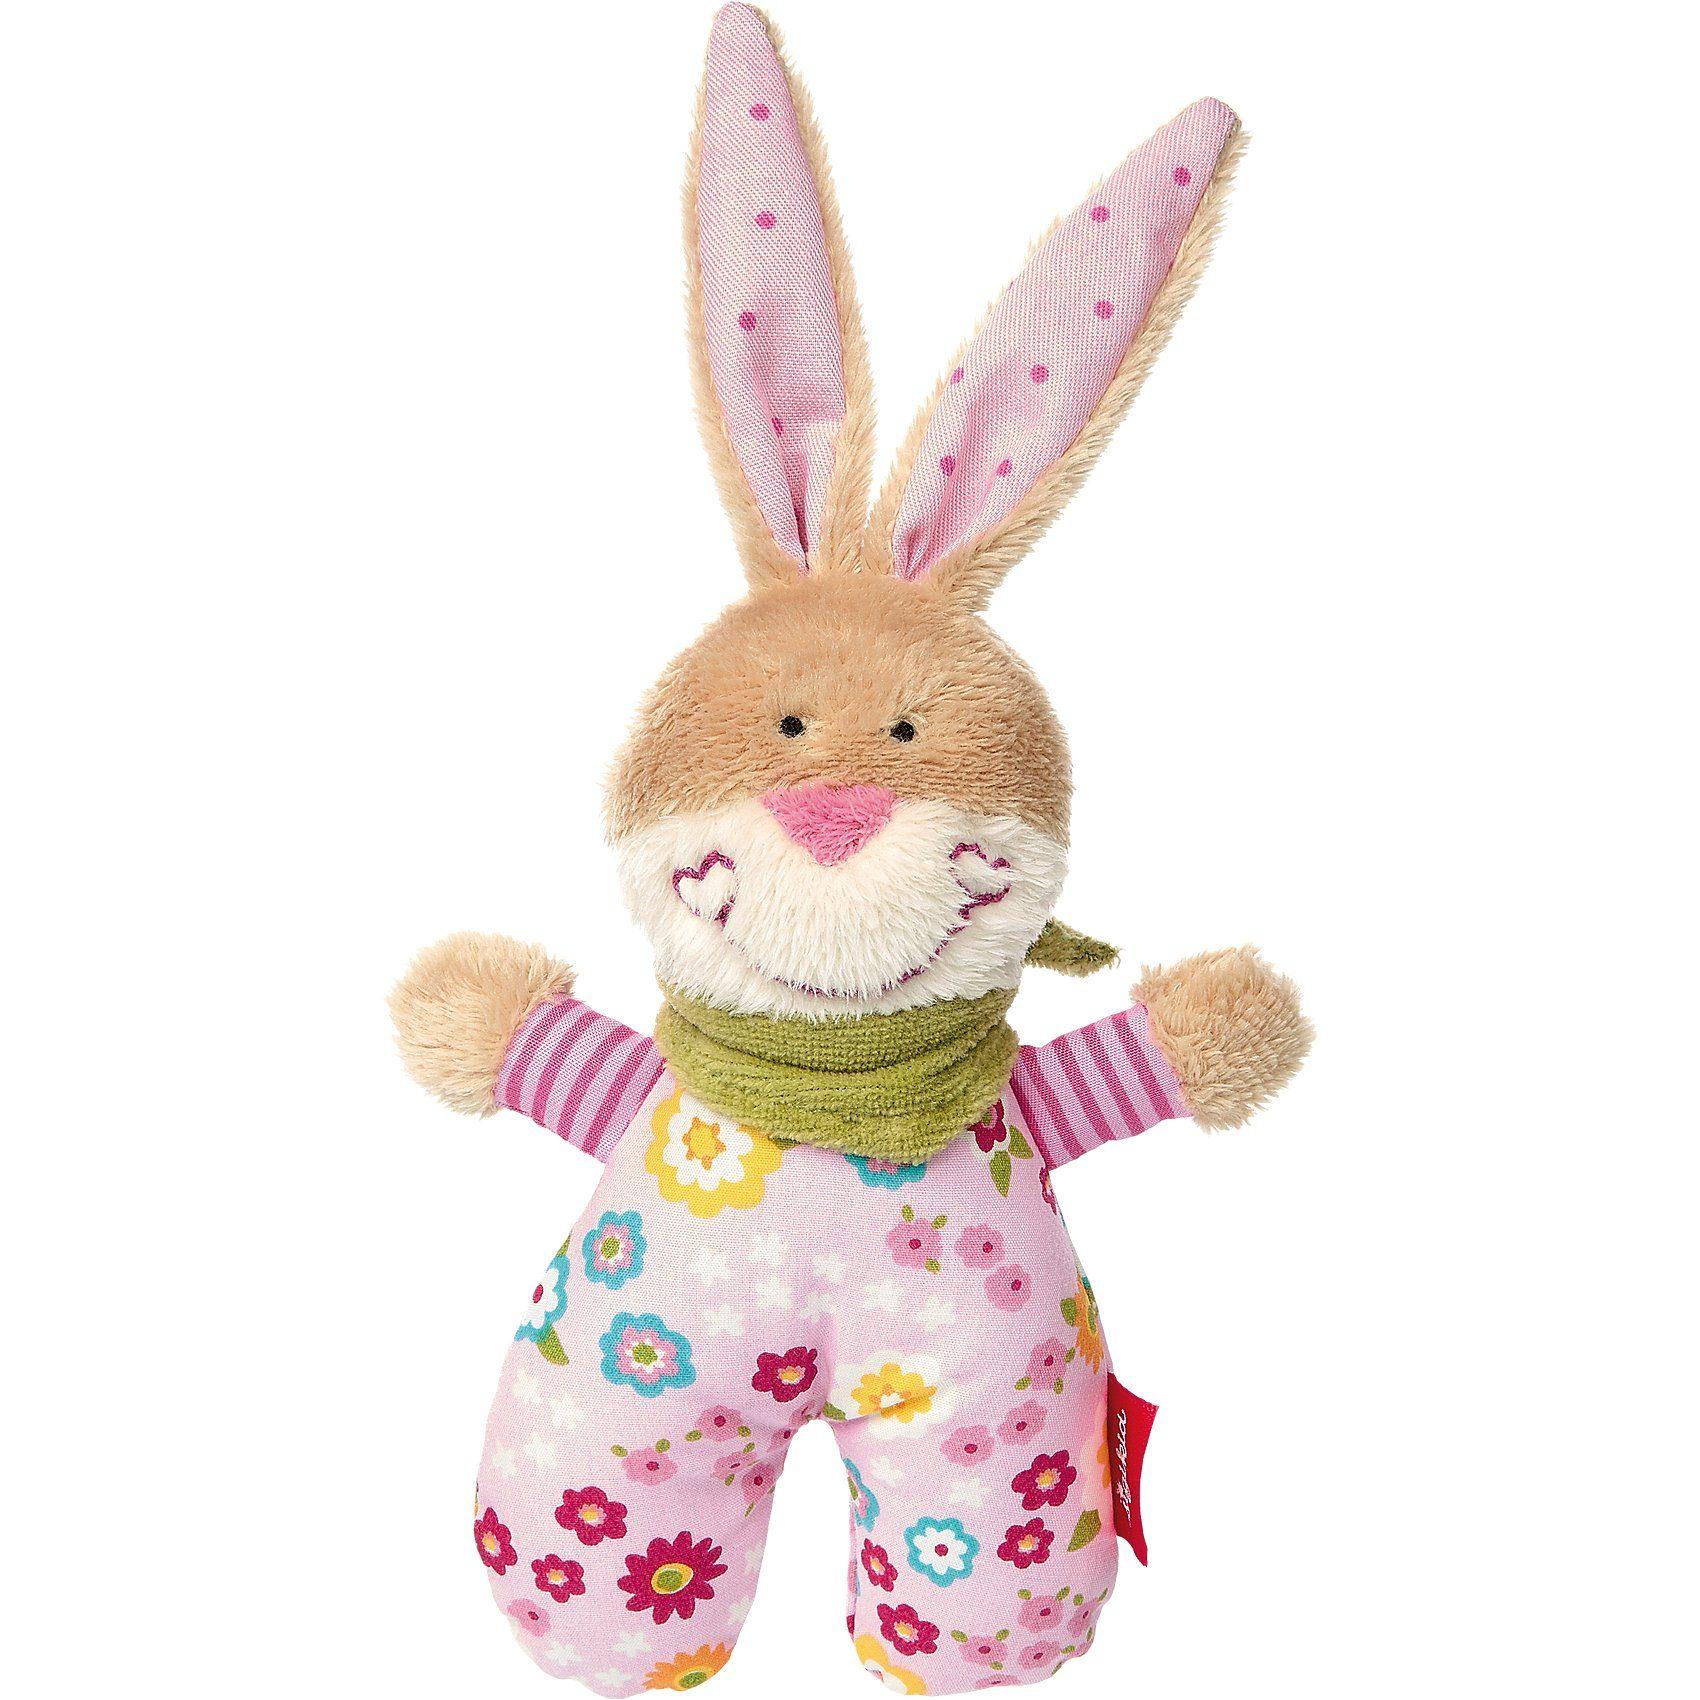 Sigikid Rassel Bungee Bunny (41422)